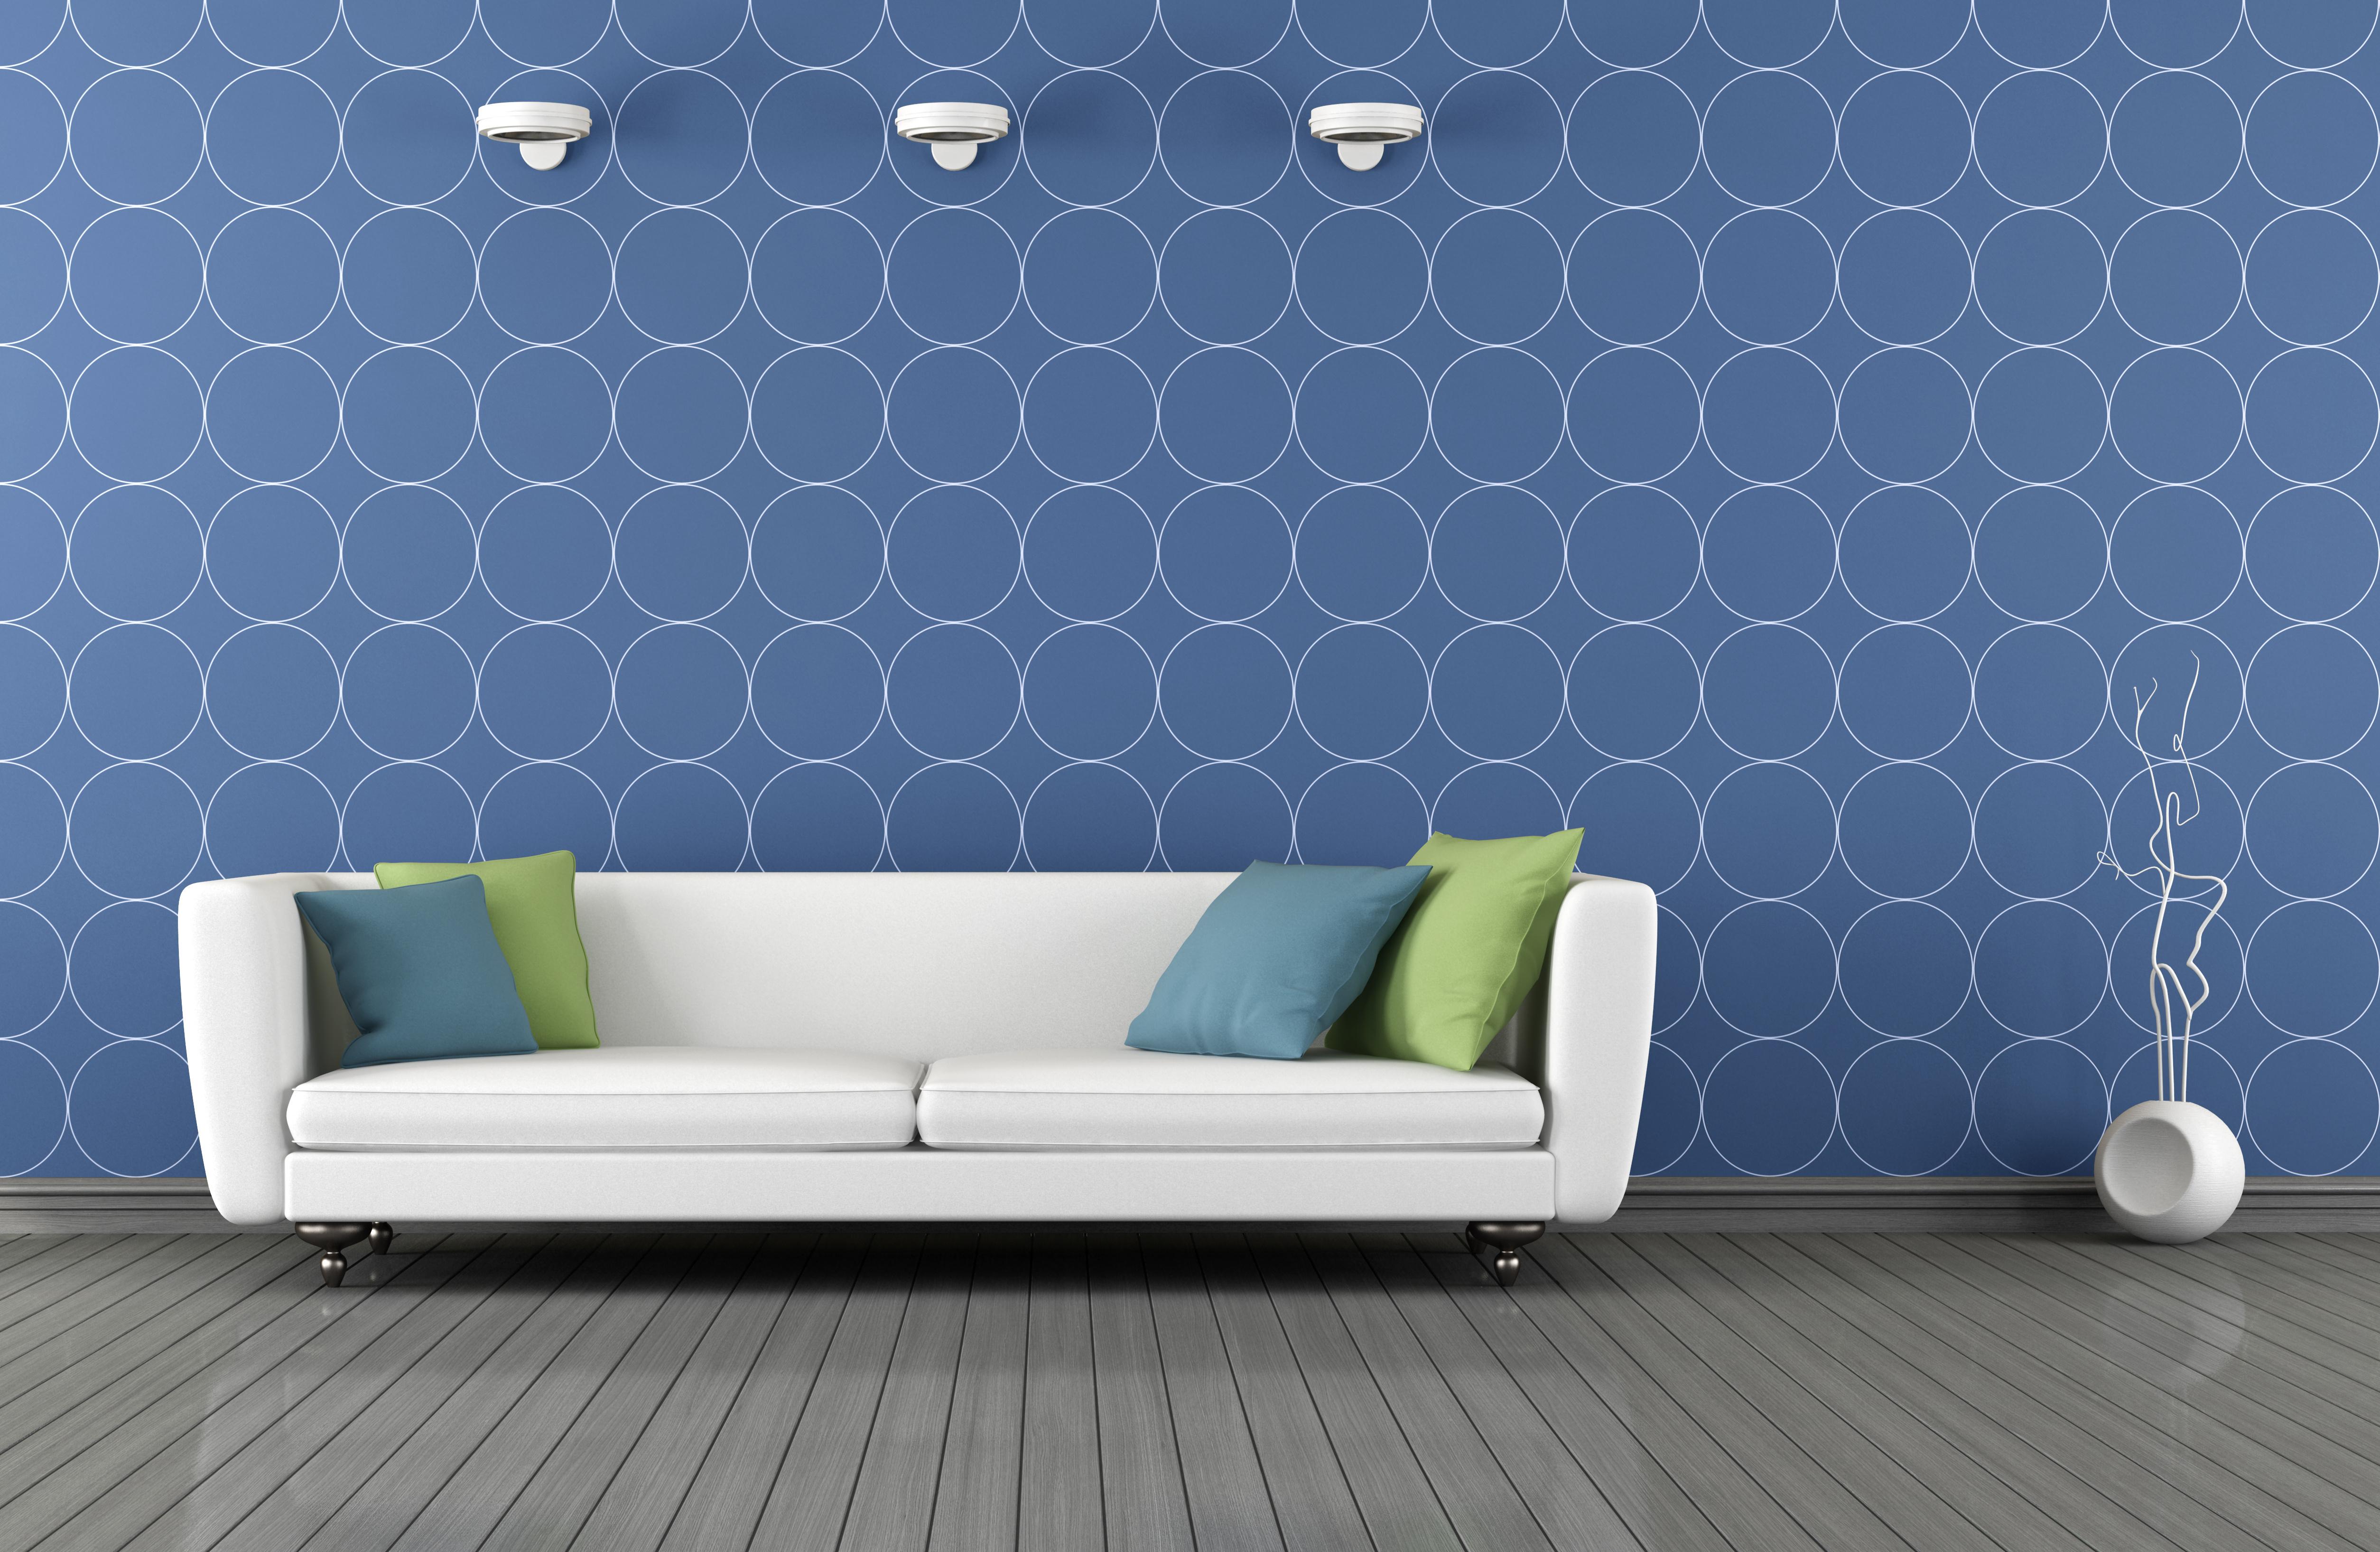 Interior Wallpapers HD Download free  PixelsTalkNet